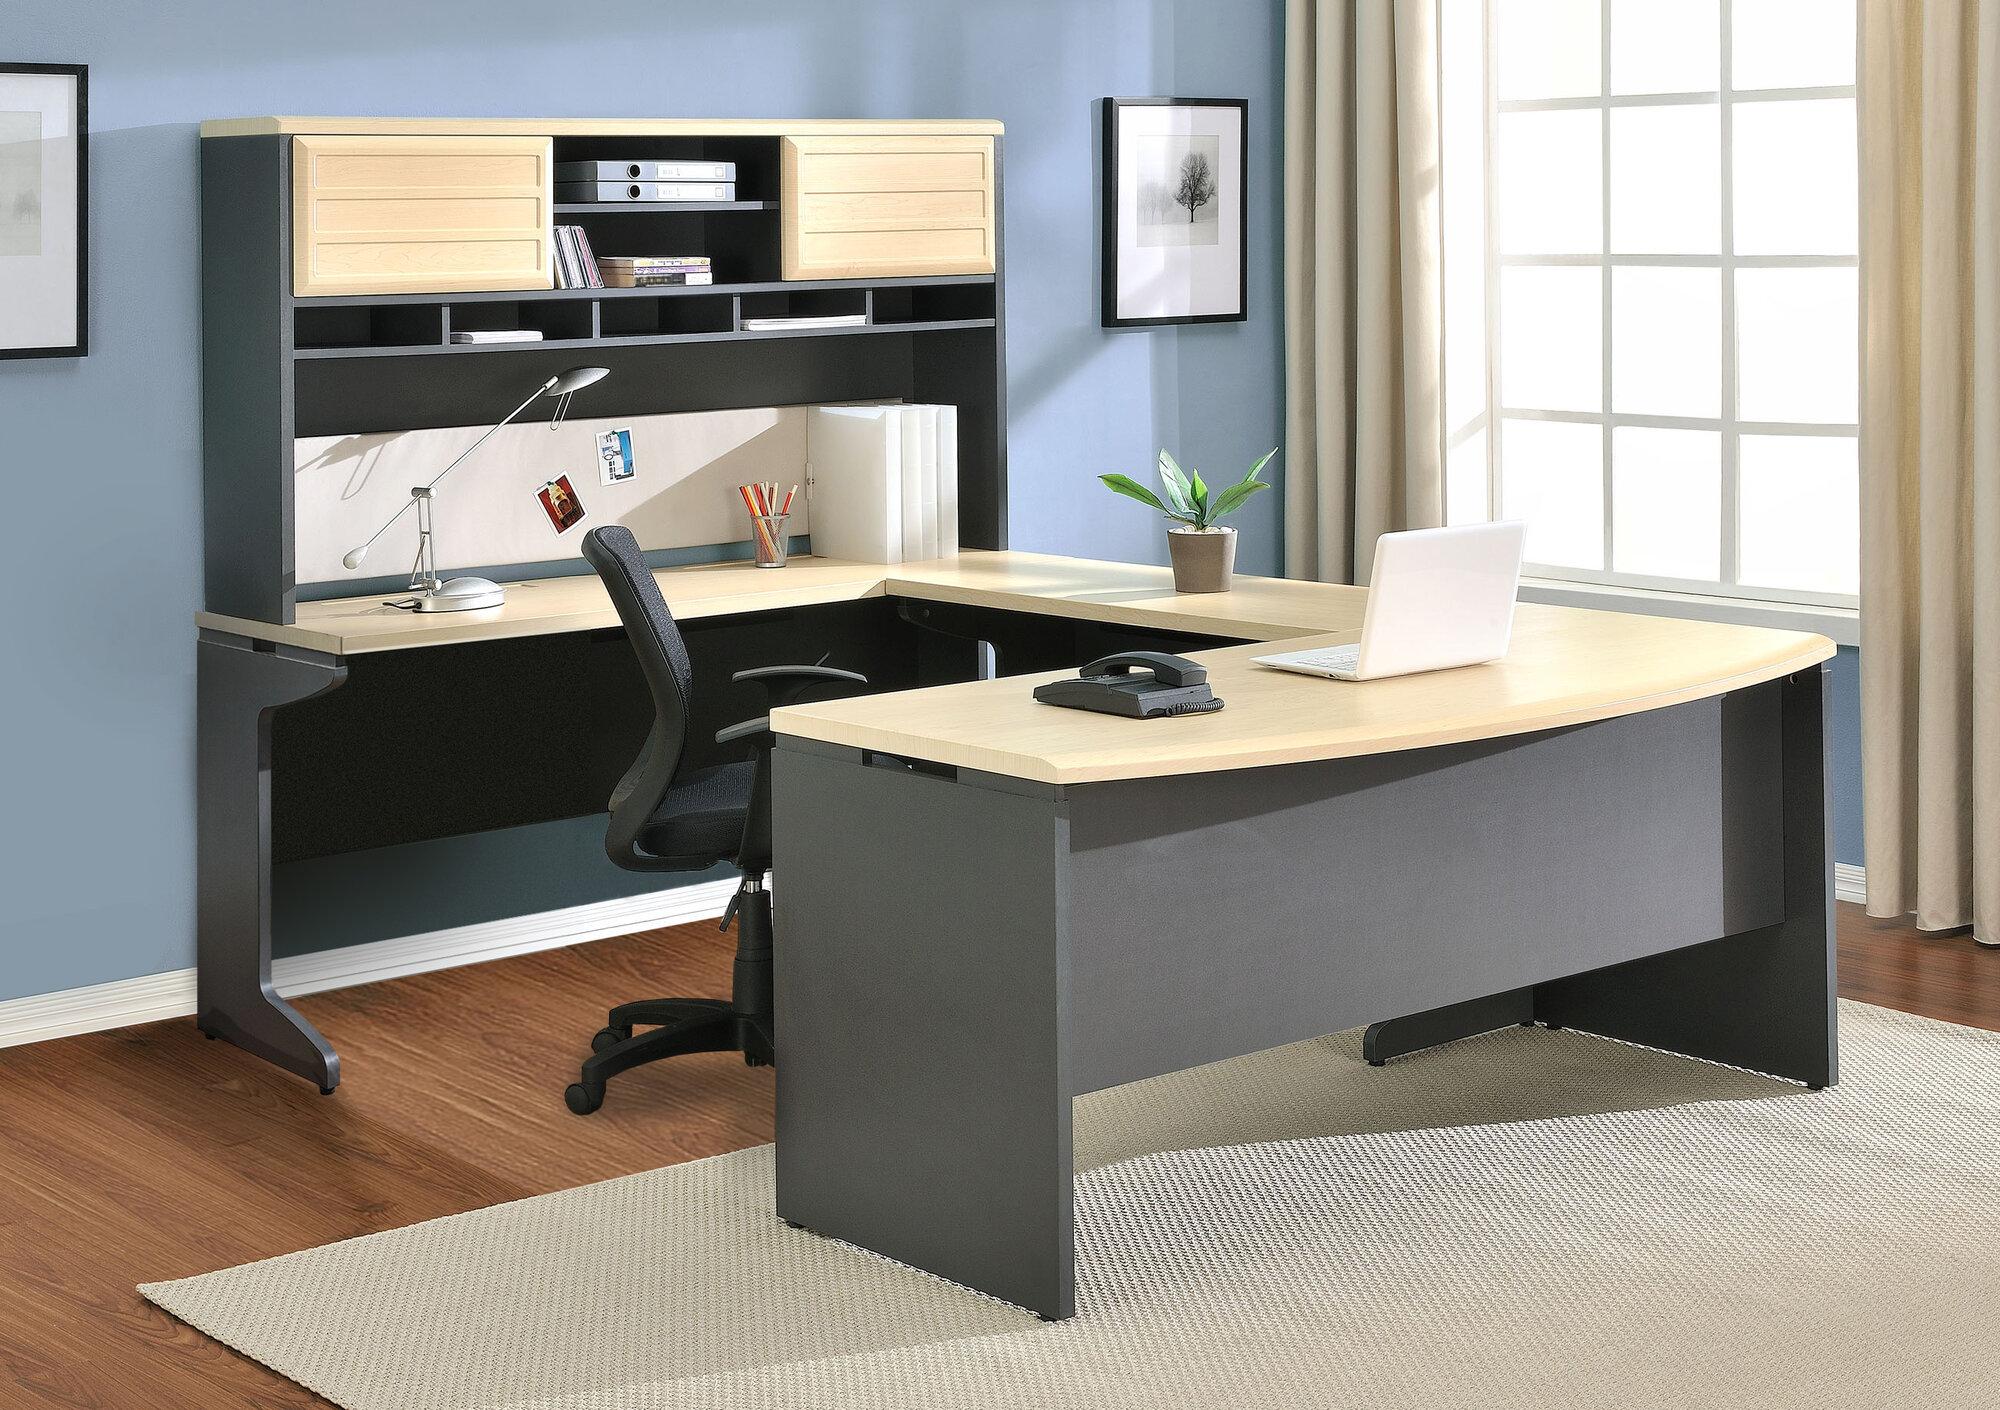 Details about Altra Furniture Benjamin U-Shape Desk Office Suite